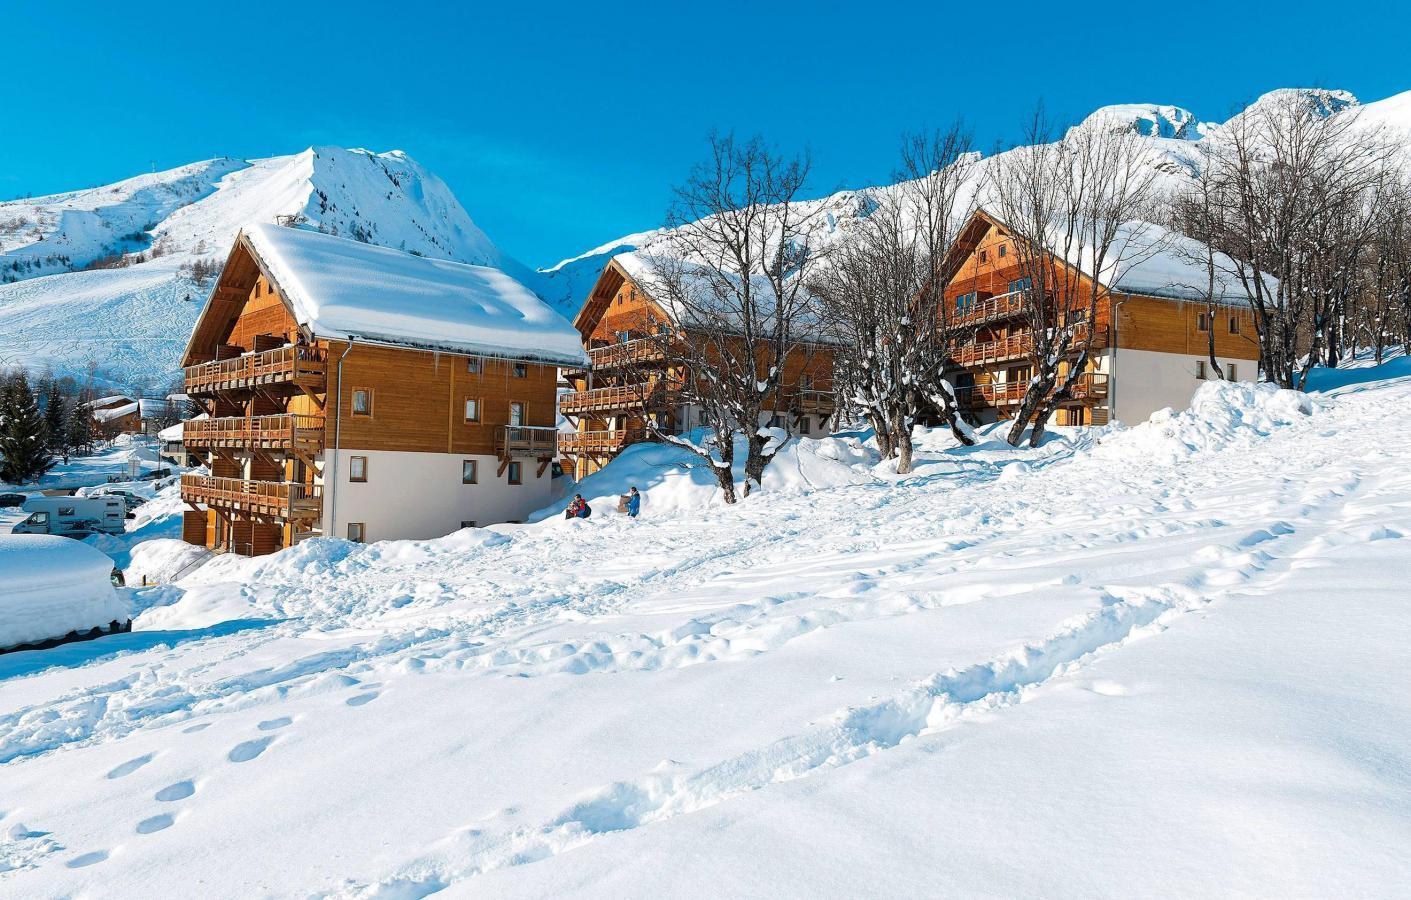 station de ski saint sorlin d 39 arves alpes du nord savoie vacances. Black Bedroom Furniture Sets. Home Design Ideas